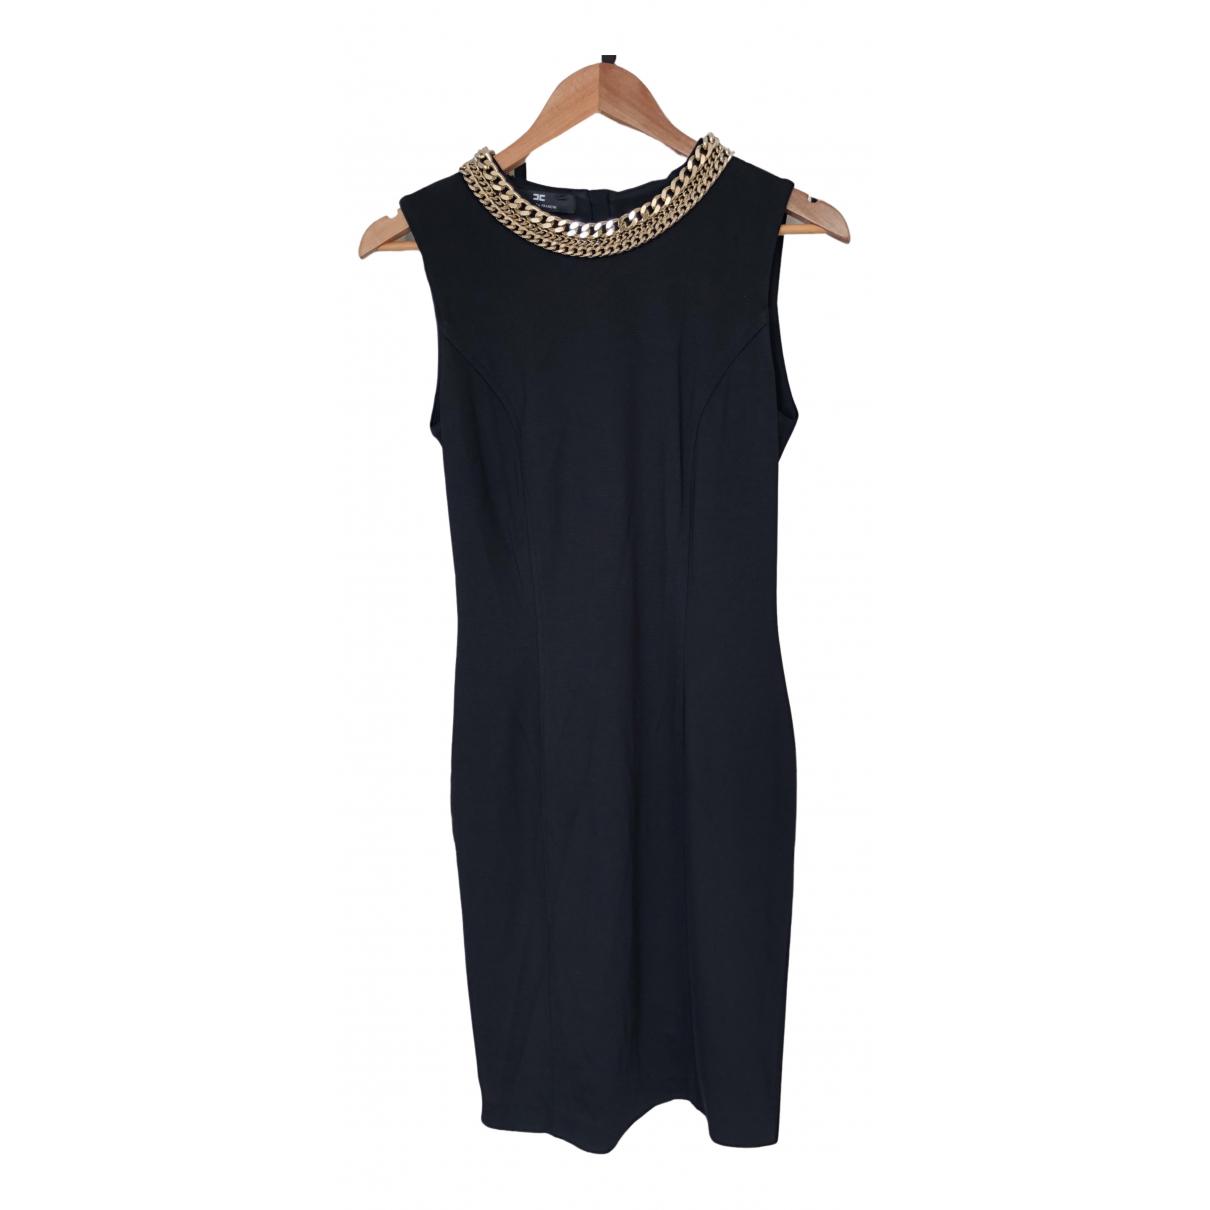 Elisabetta Franchi N Black dress for Women 44 IT